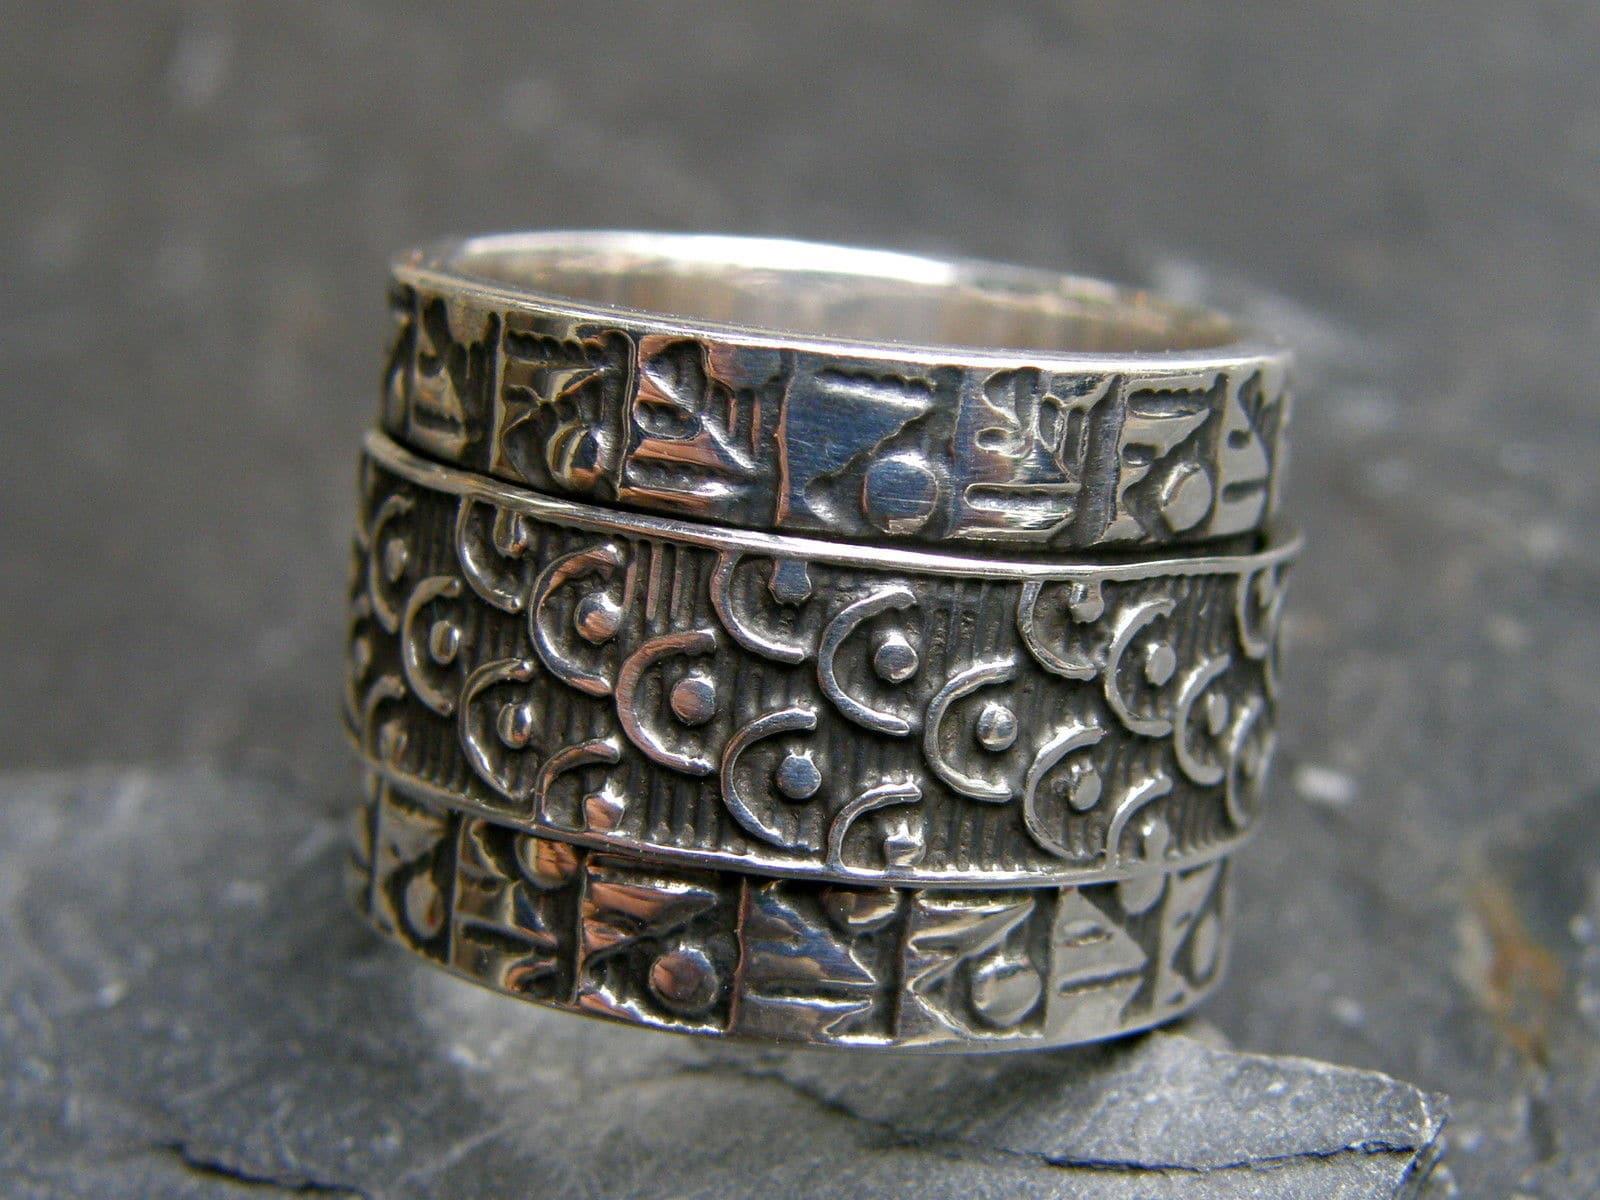 Designer Ring Silber 925 mit ornamentalem Muster beweglich